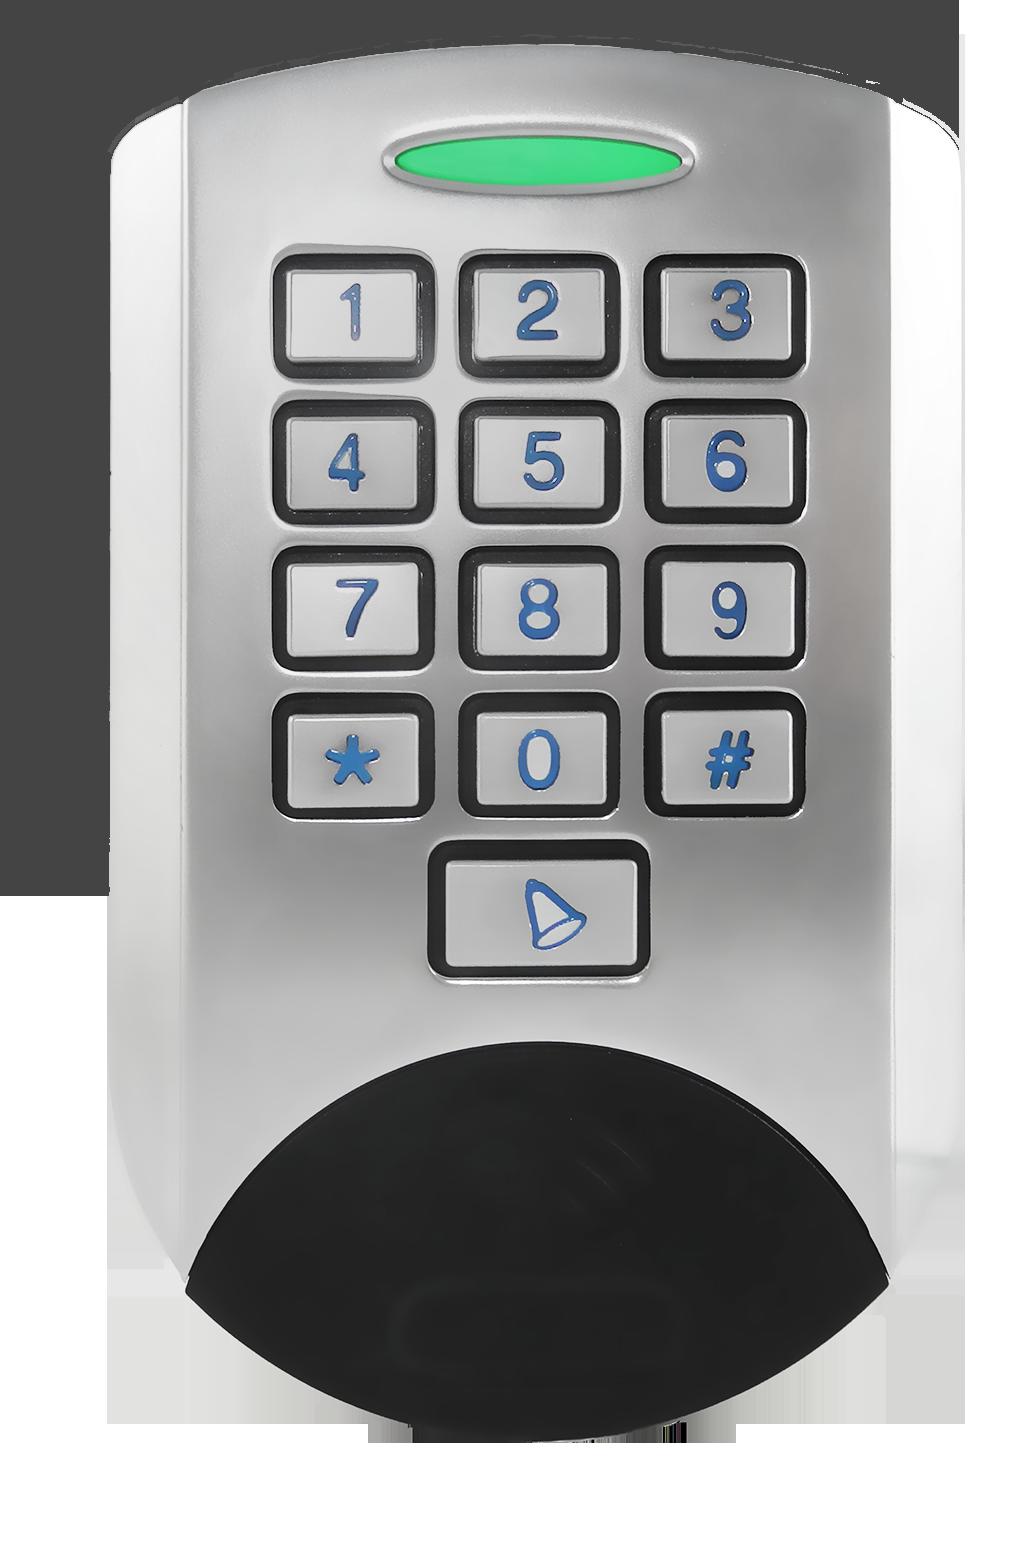 Popp Keypad Four Digit Operated Switch Sku Pope700045